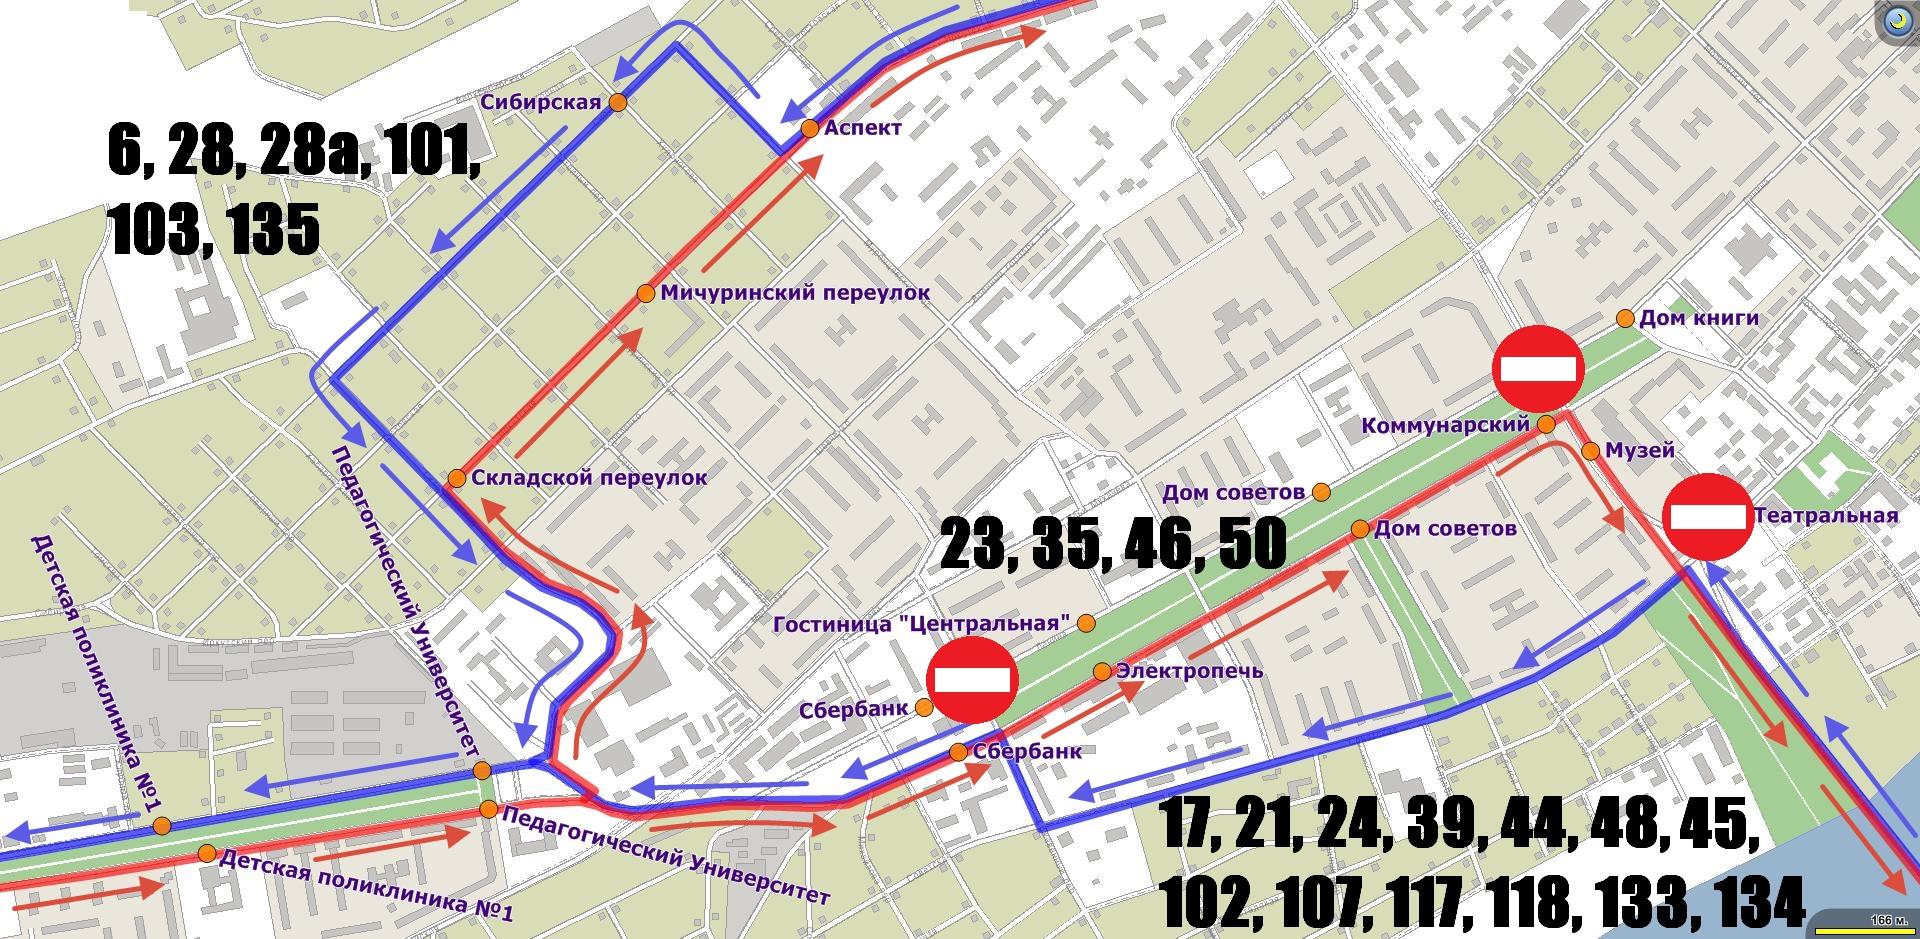 183 маршрут схема движения